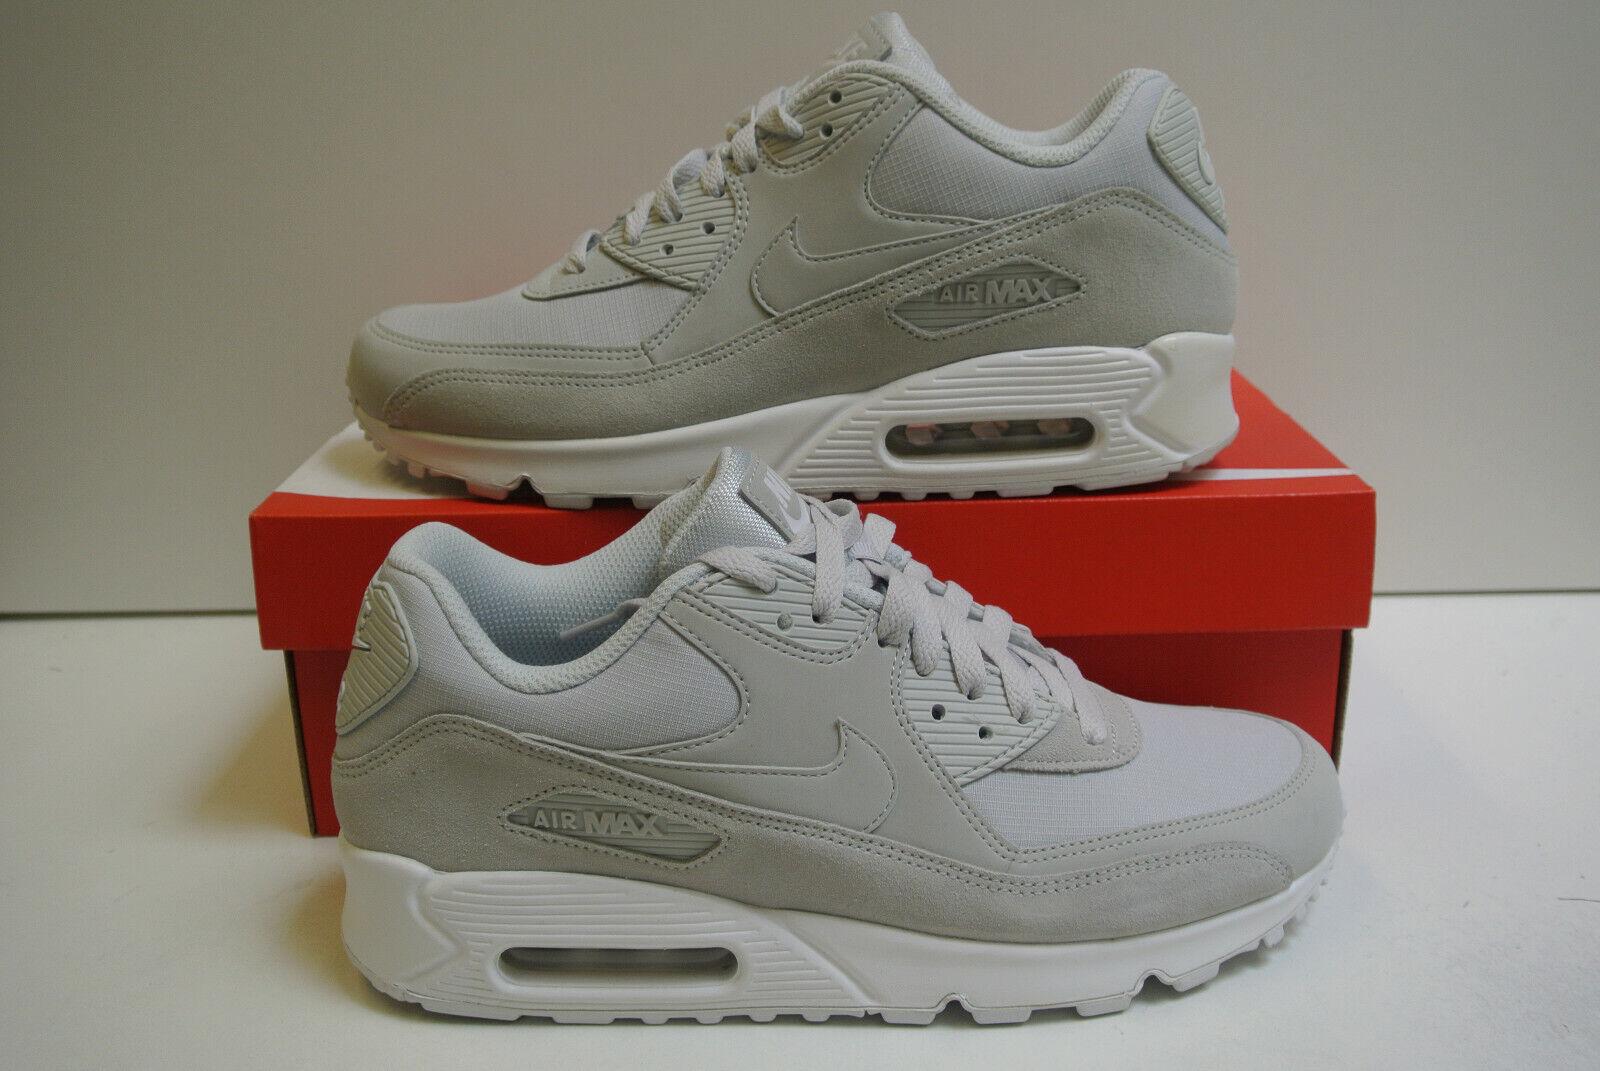 Nike Air Max 90 Essential Schuhe Sneaker Herren Echtleder Grau Blau